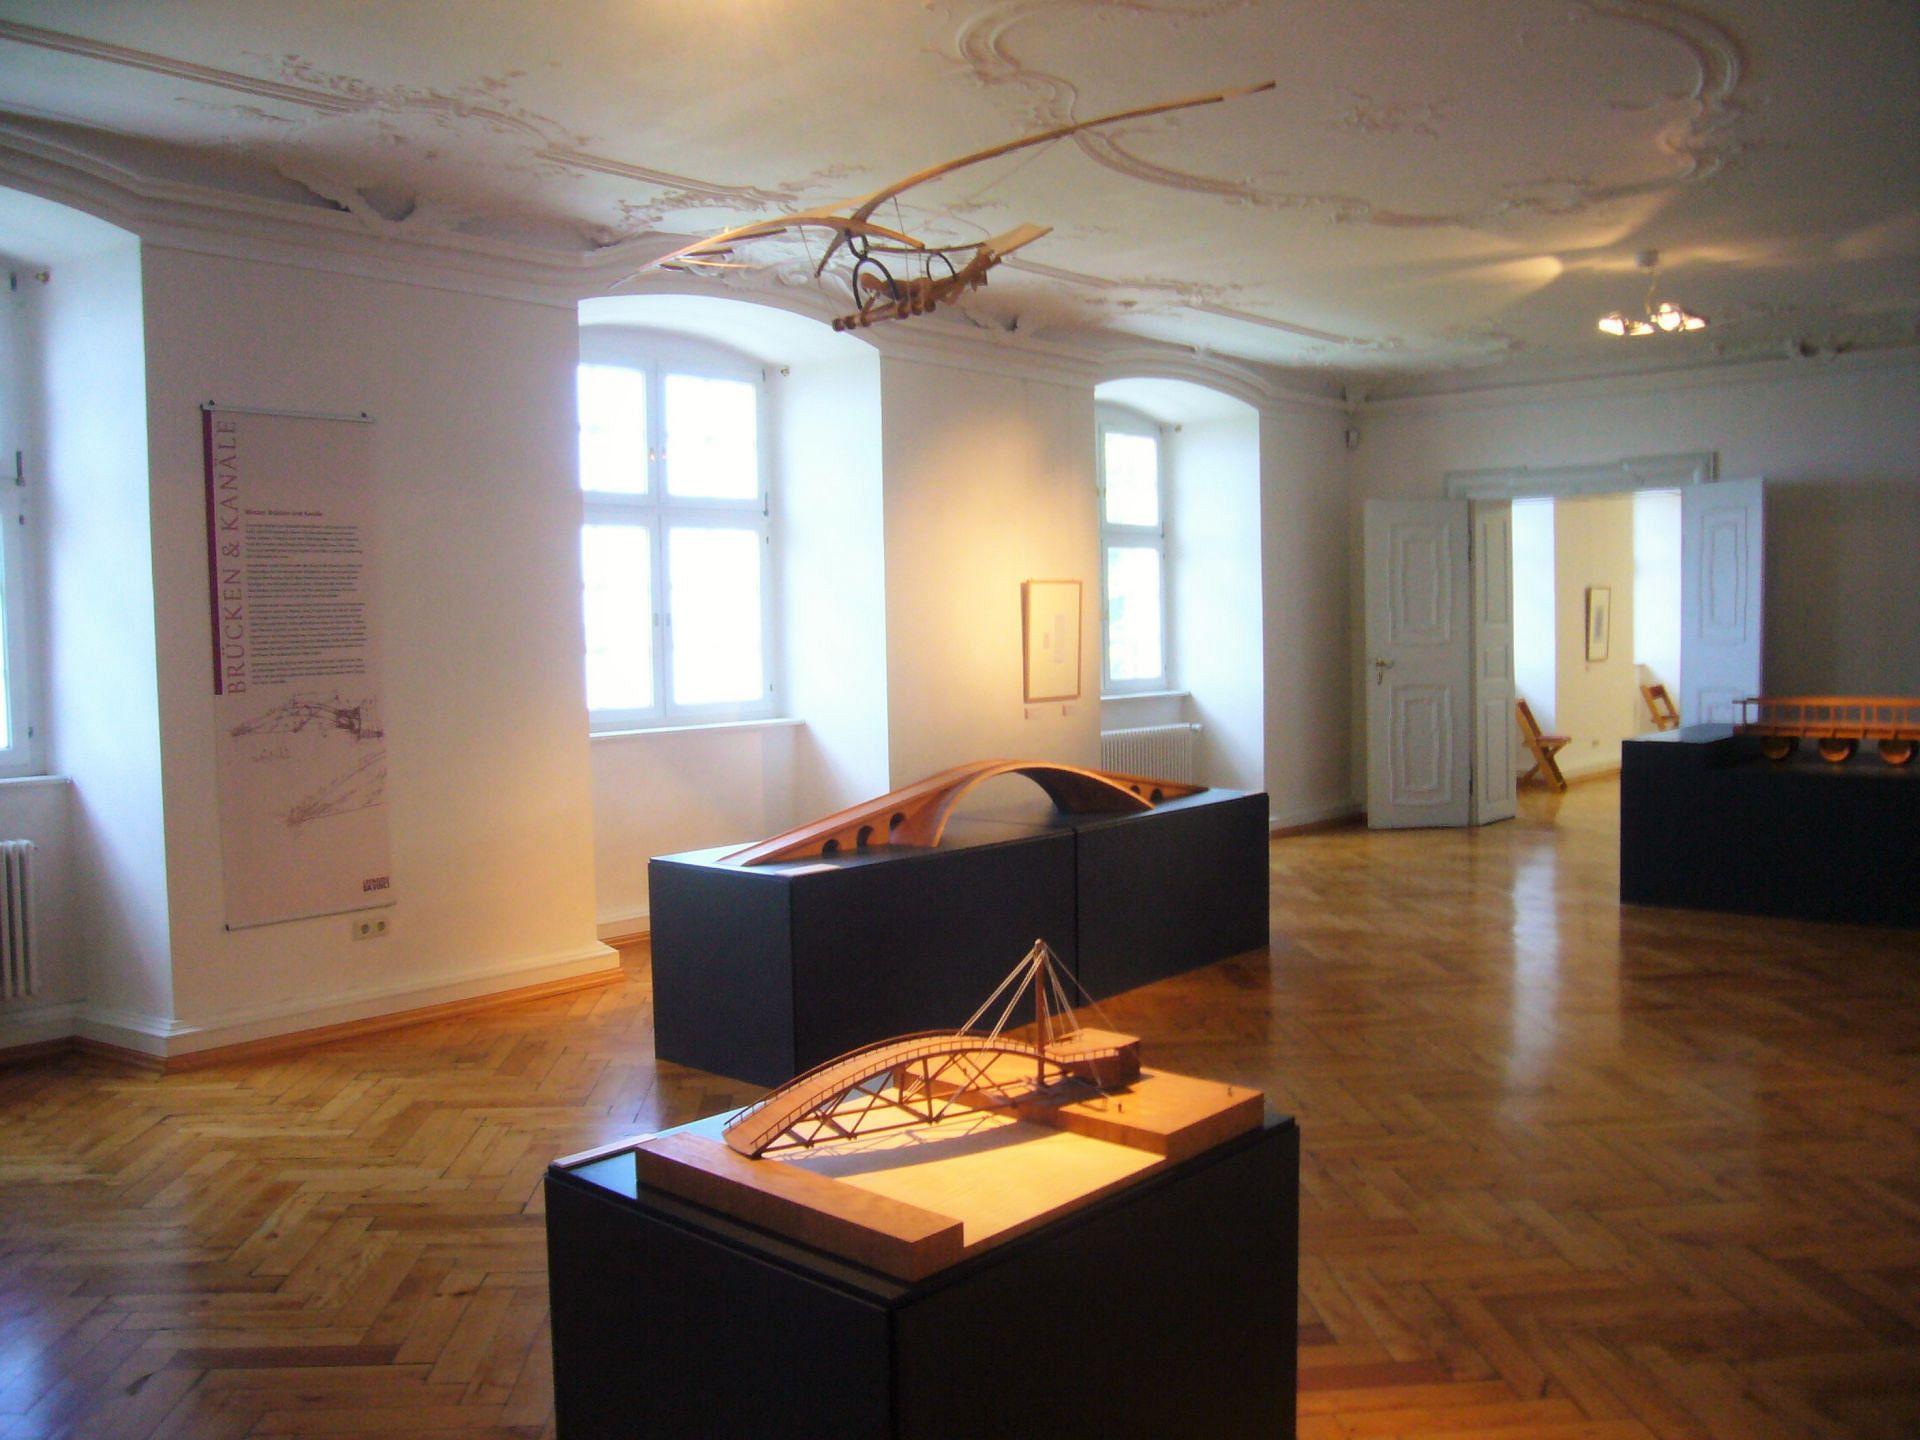 Installation view at Neues Schloss Meersburg, Germany